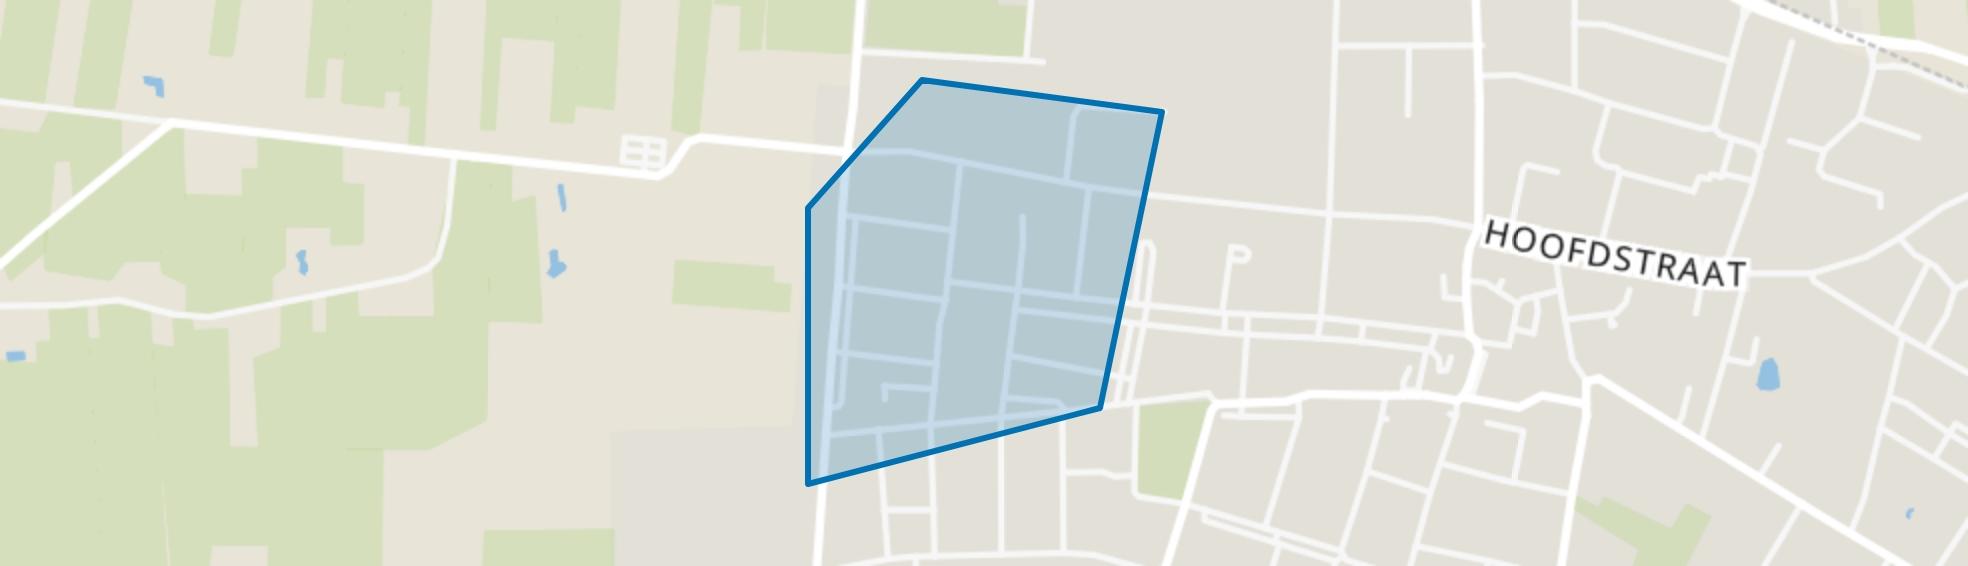 Vossenberg (west), Kaatsheuvel map